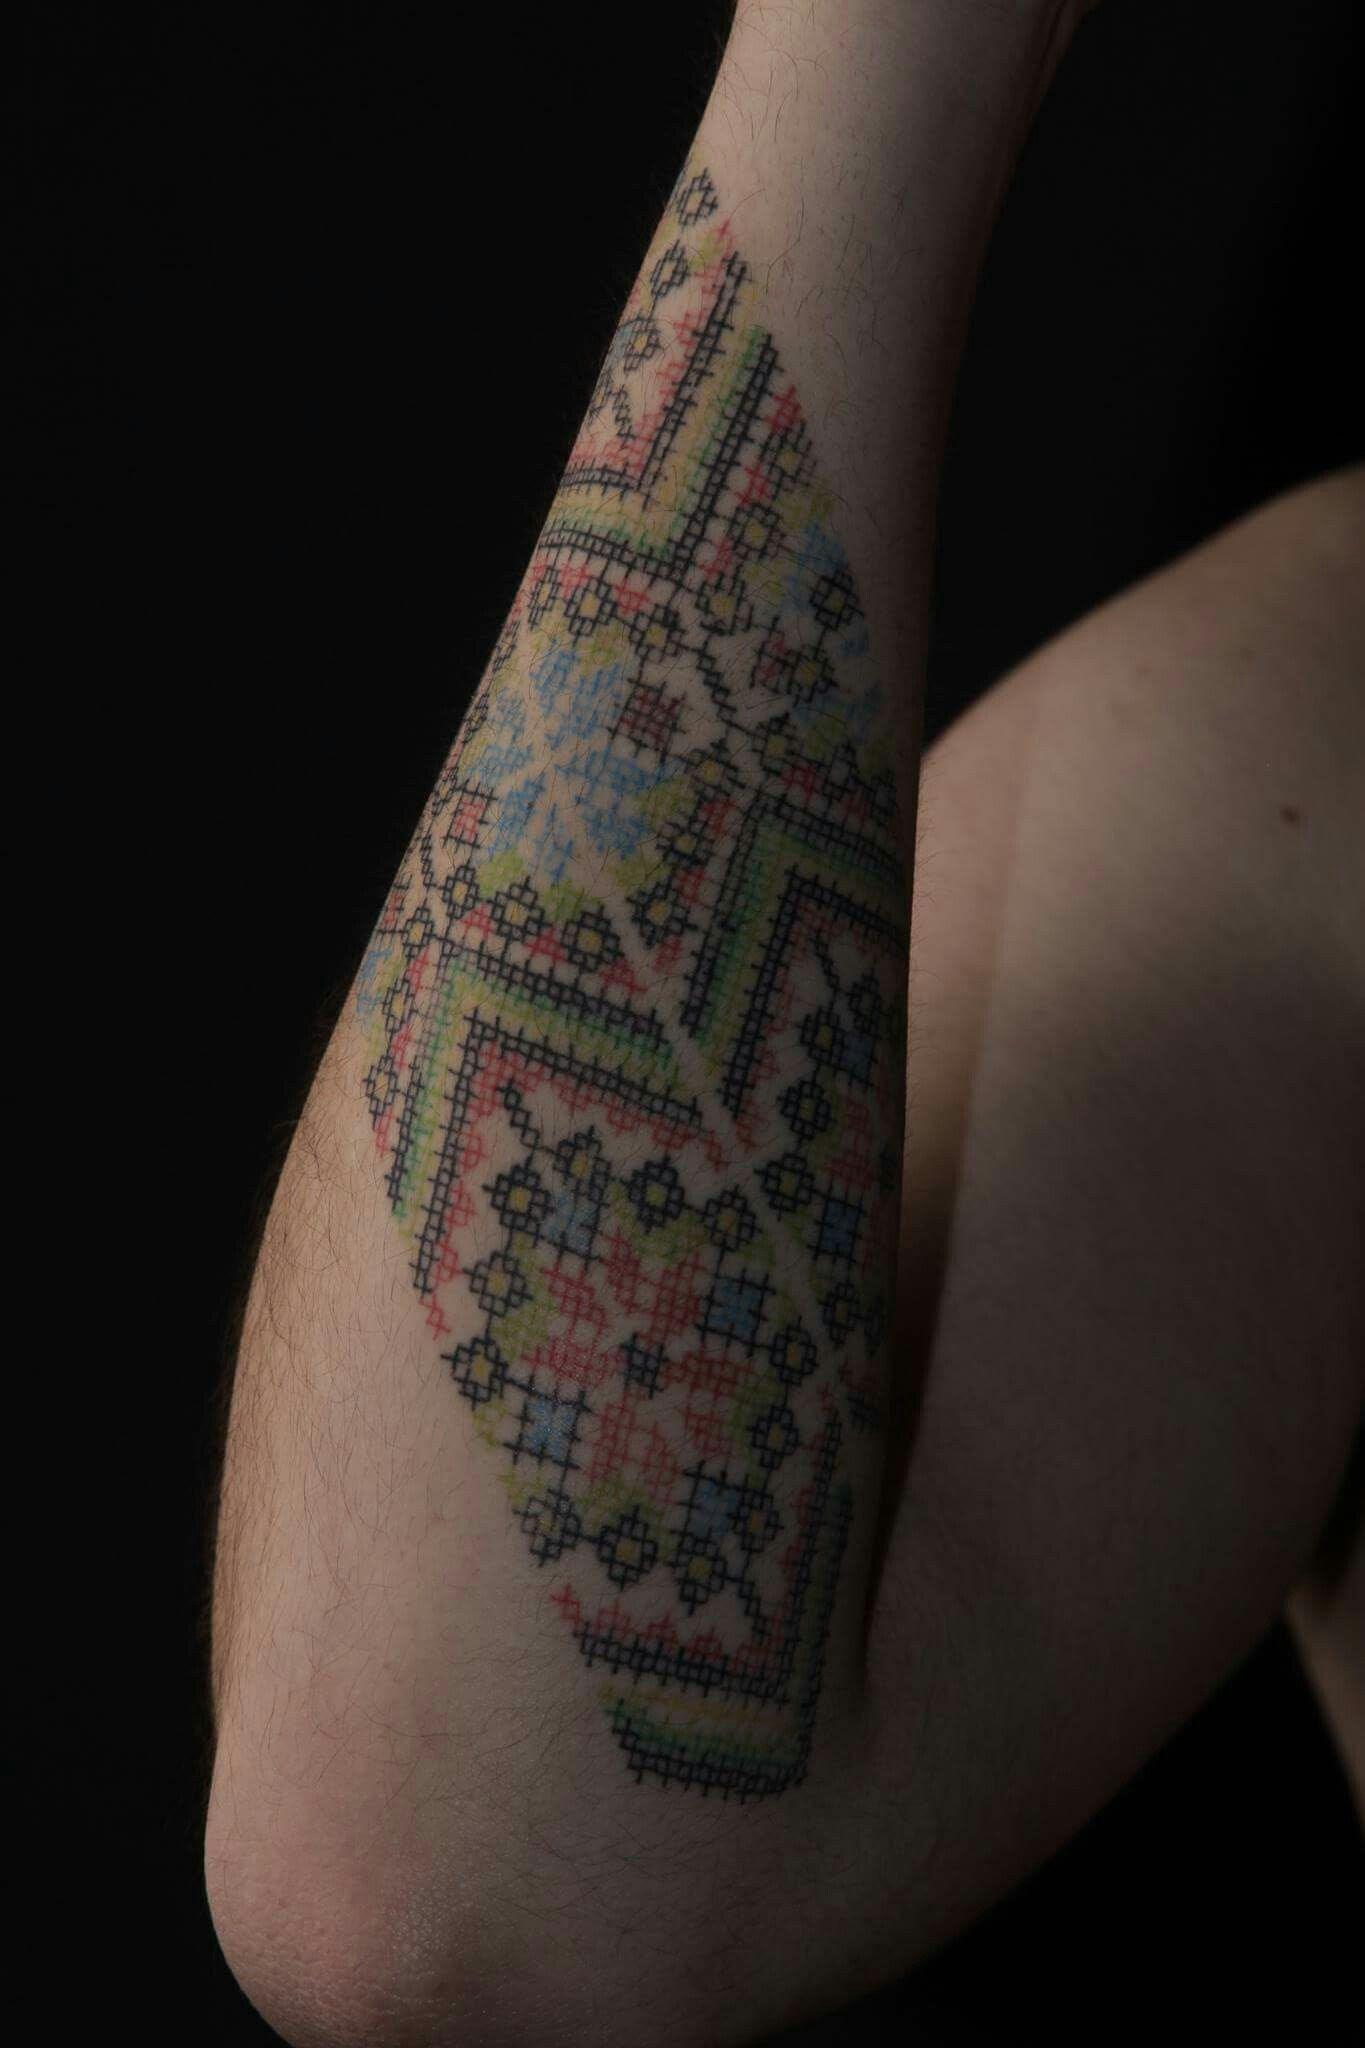 Arte Huichol Tatuajes Can T Wait To Finish This Half Sleeve Tattoo